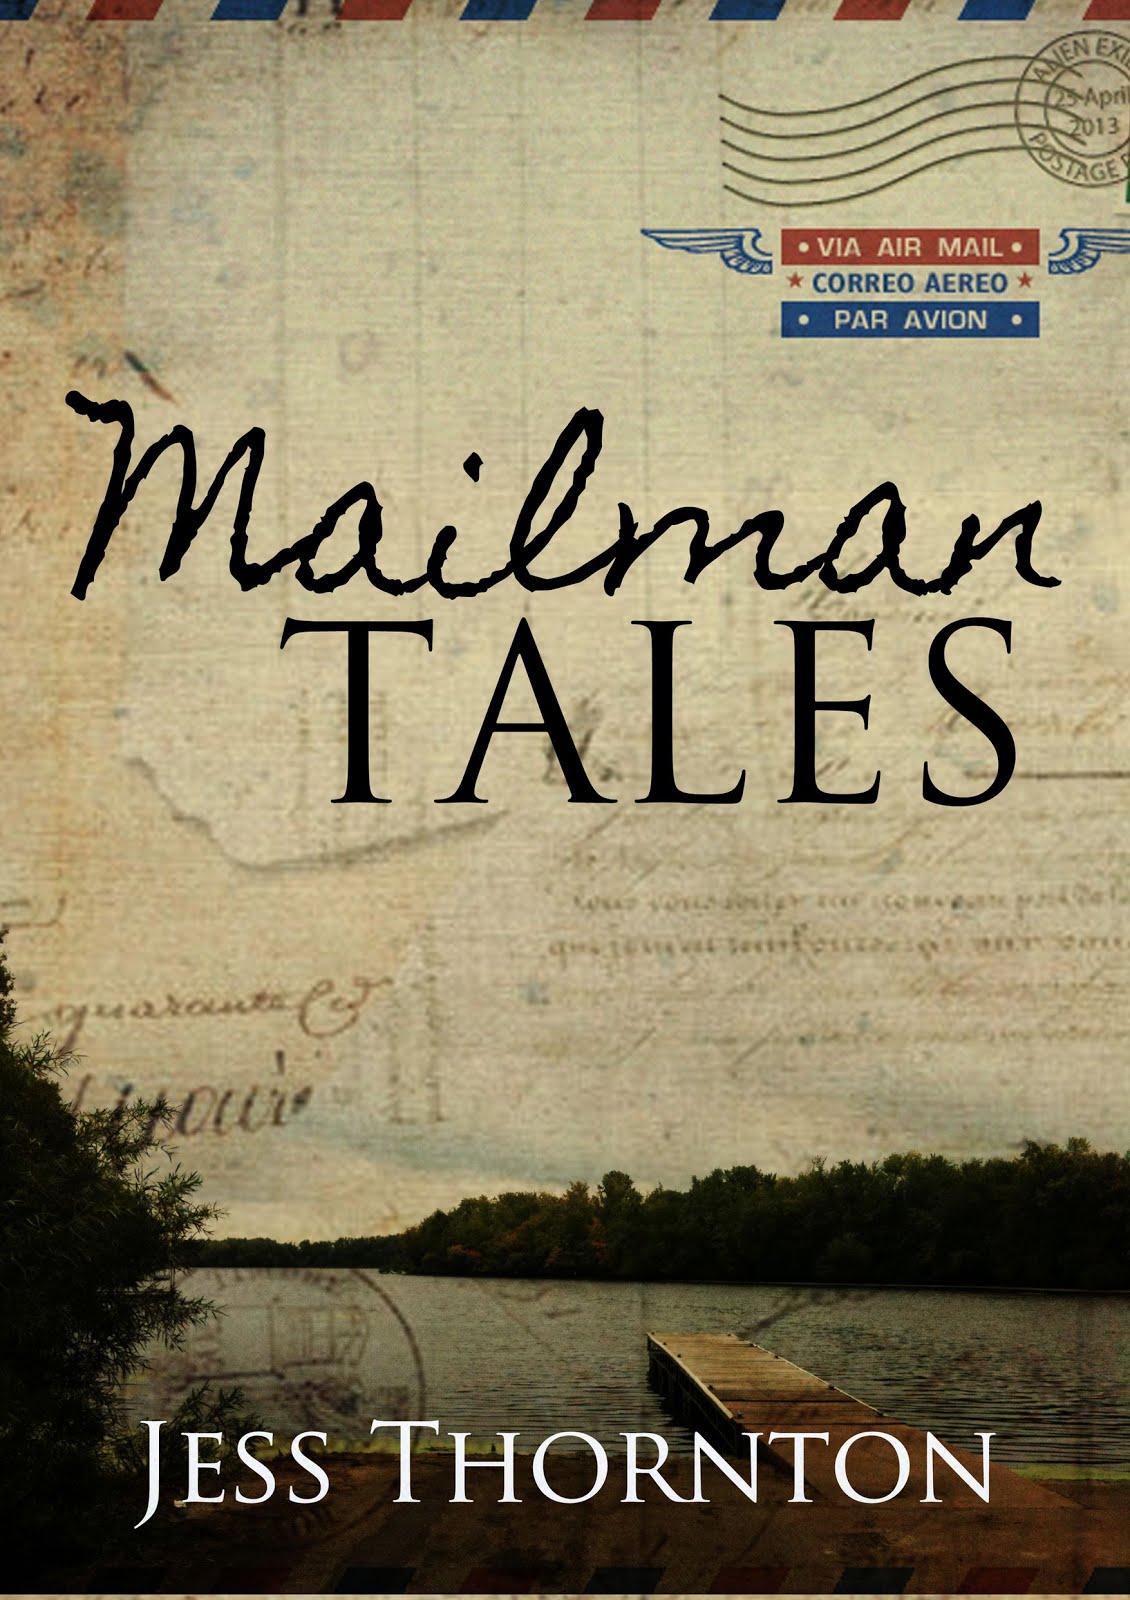 Mailman Tales